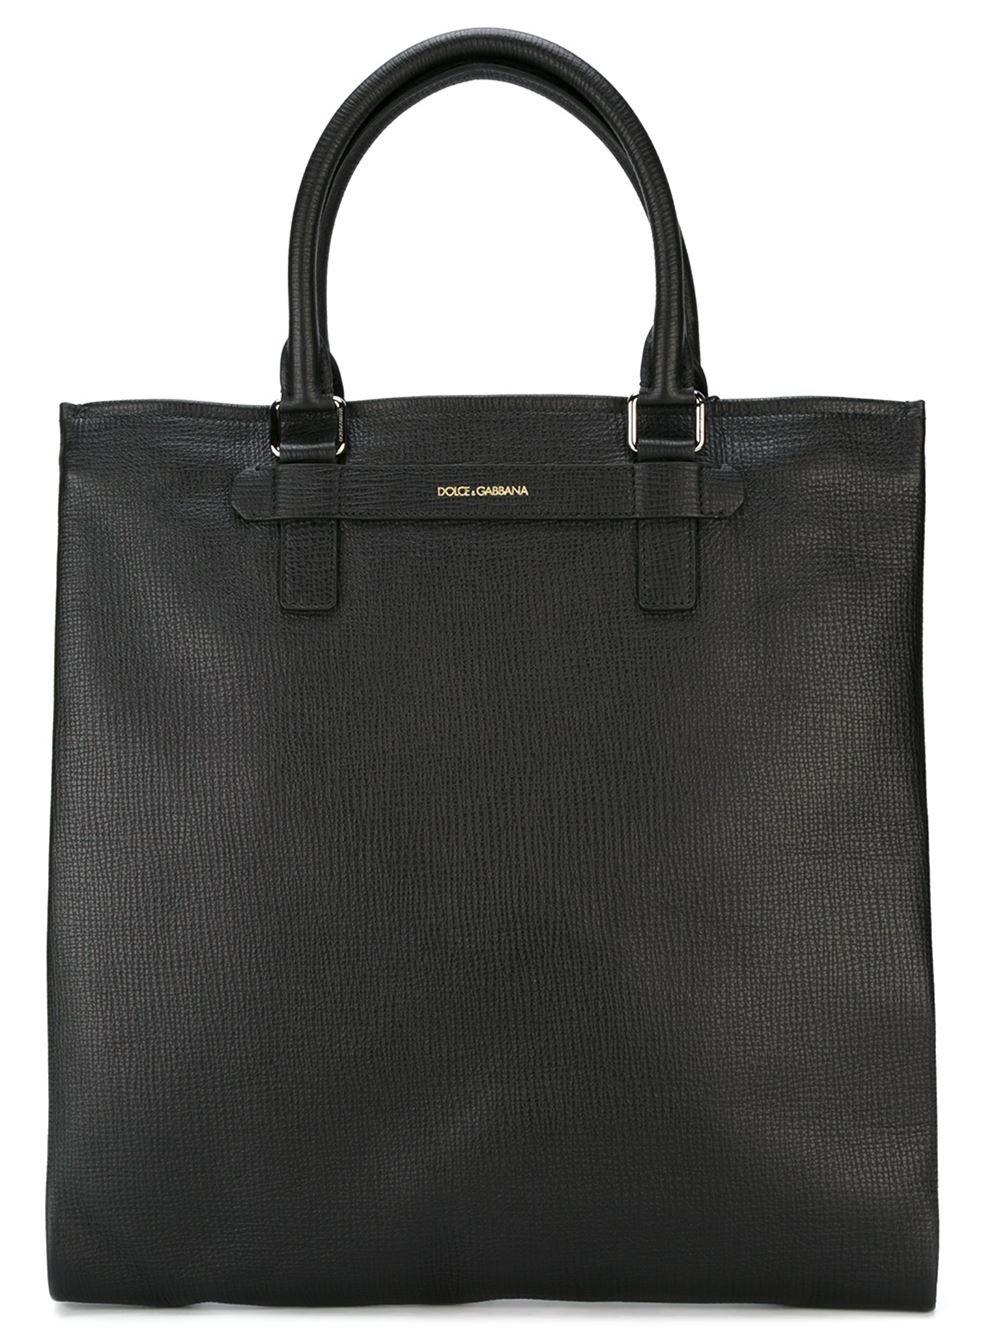 54a20ab4ed Dolce & Gabbana sac à main